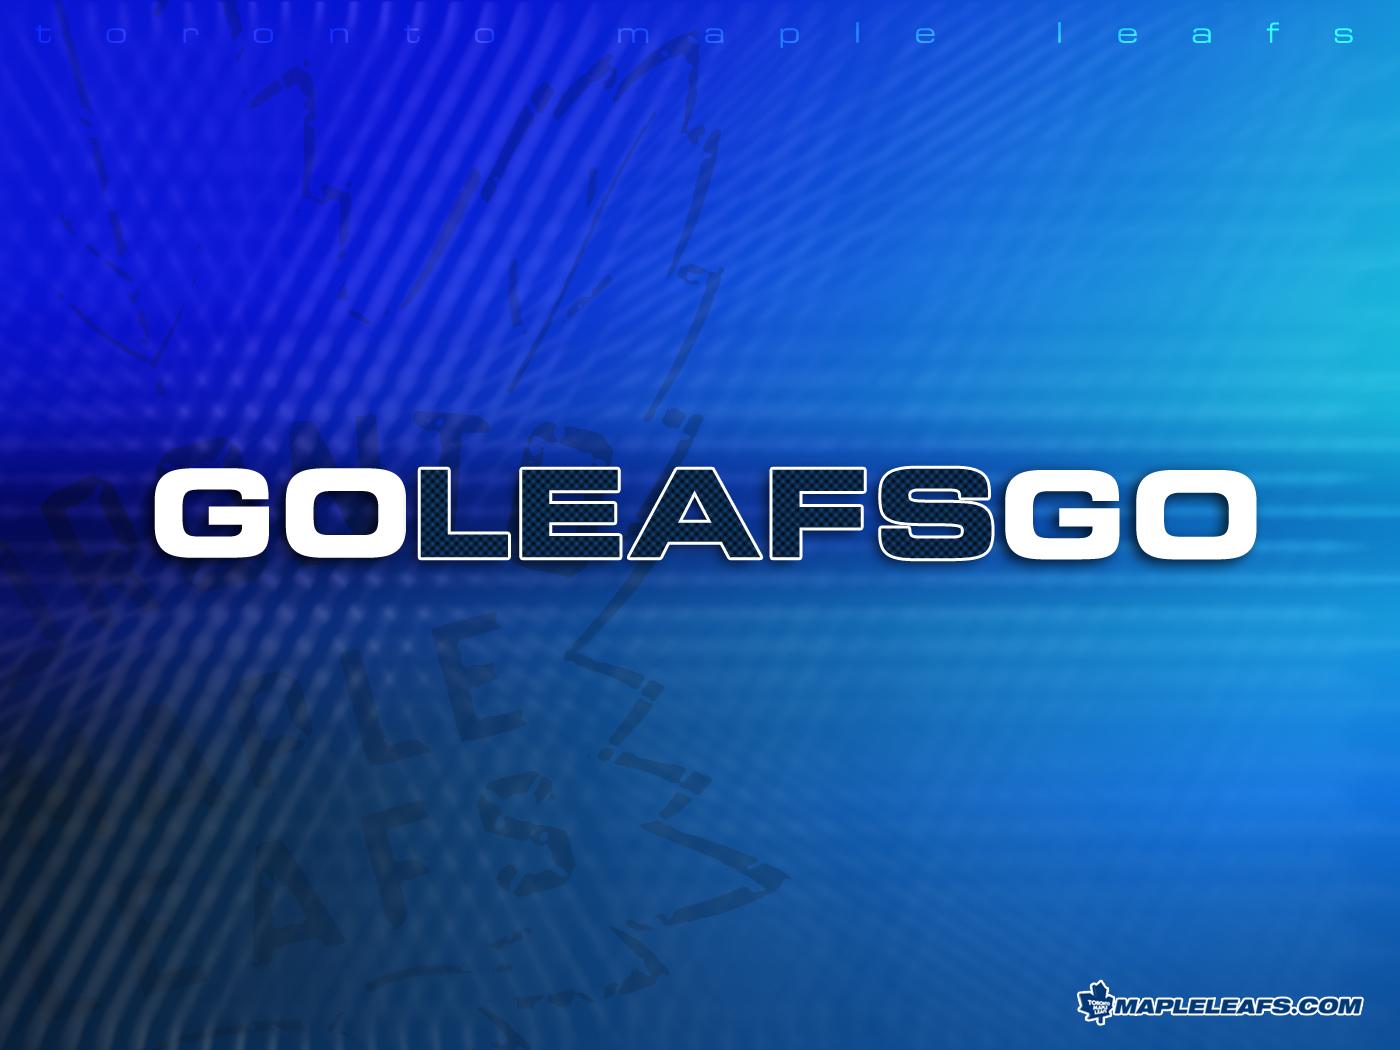 Download Toronto Maple Leafs wallpaper Go Leafs Go 1400x1050